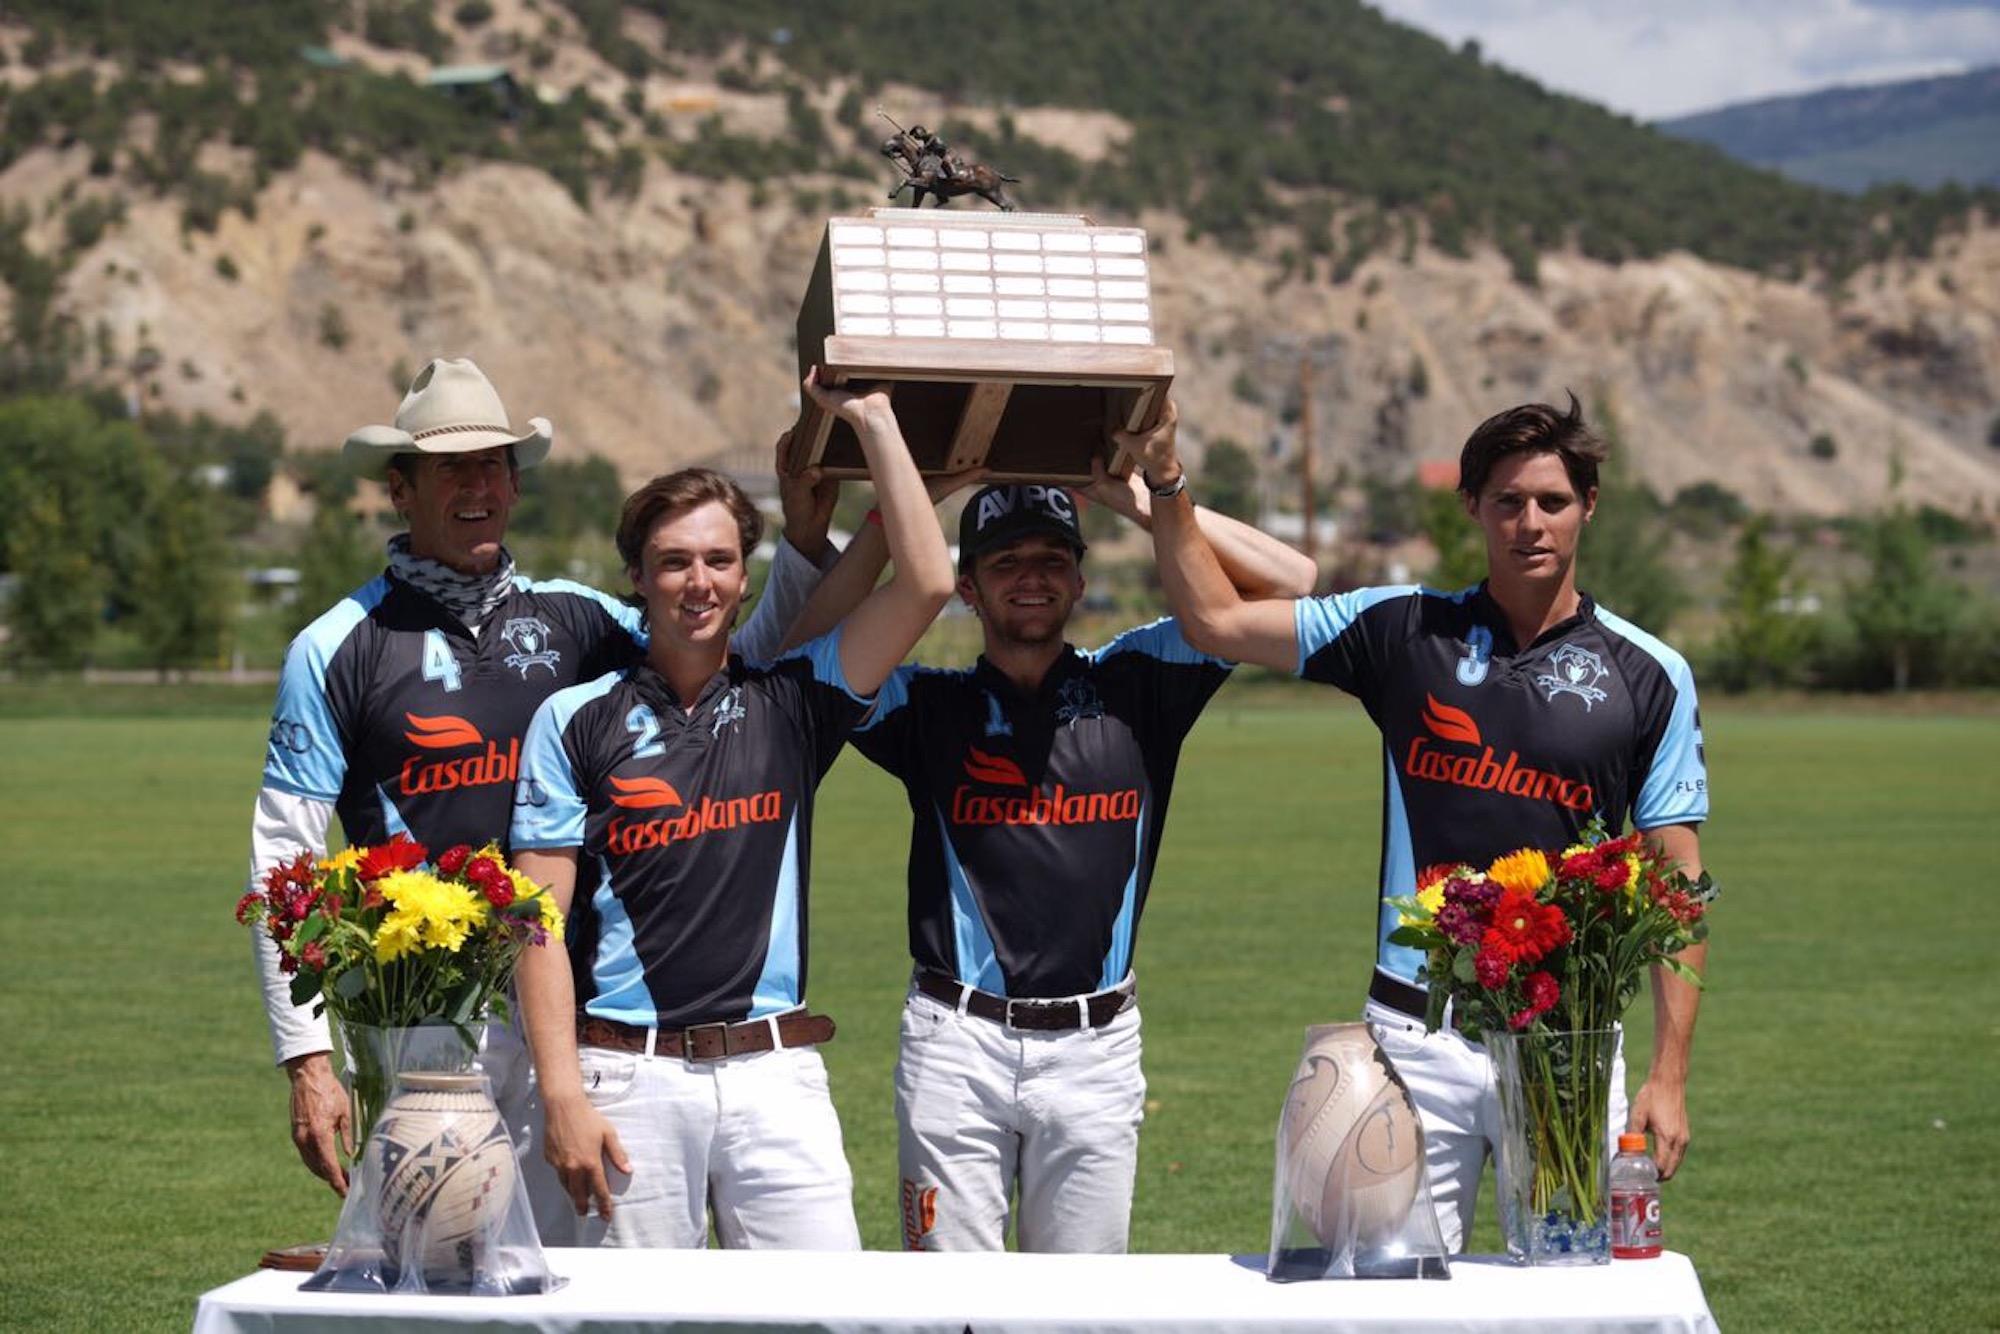 Casablanca winning teammates Stewart Armstrong, Tony Calle, Grant Ganzi and Juancito Bollini.